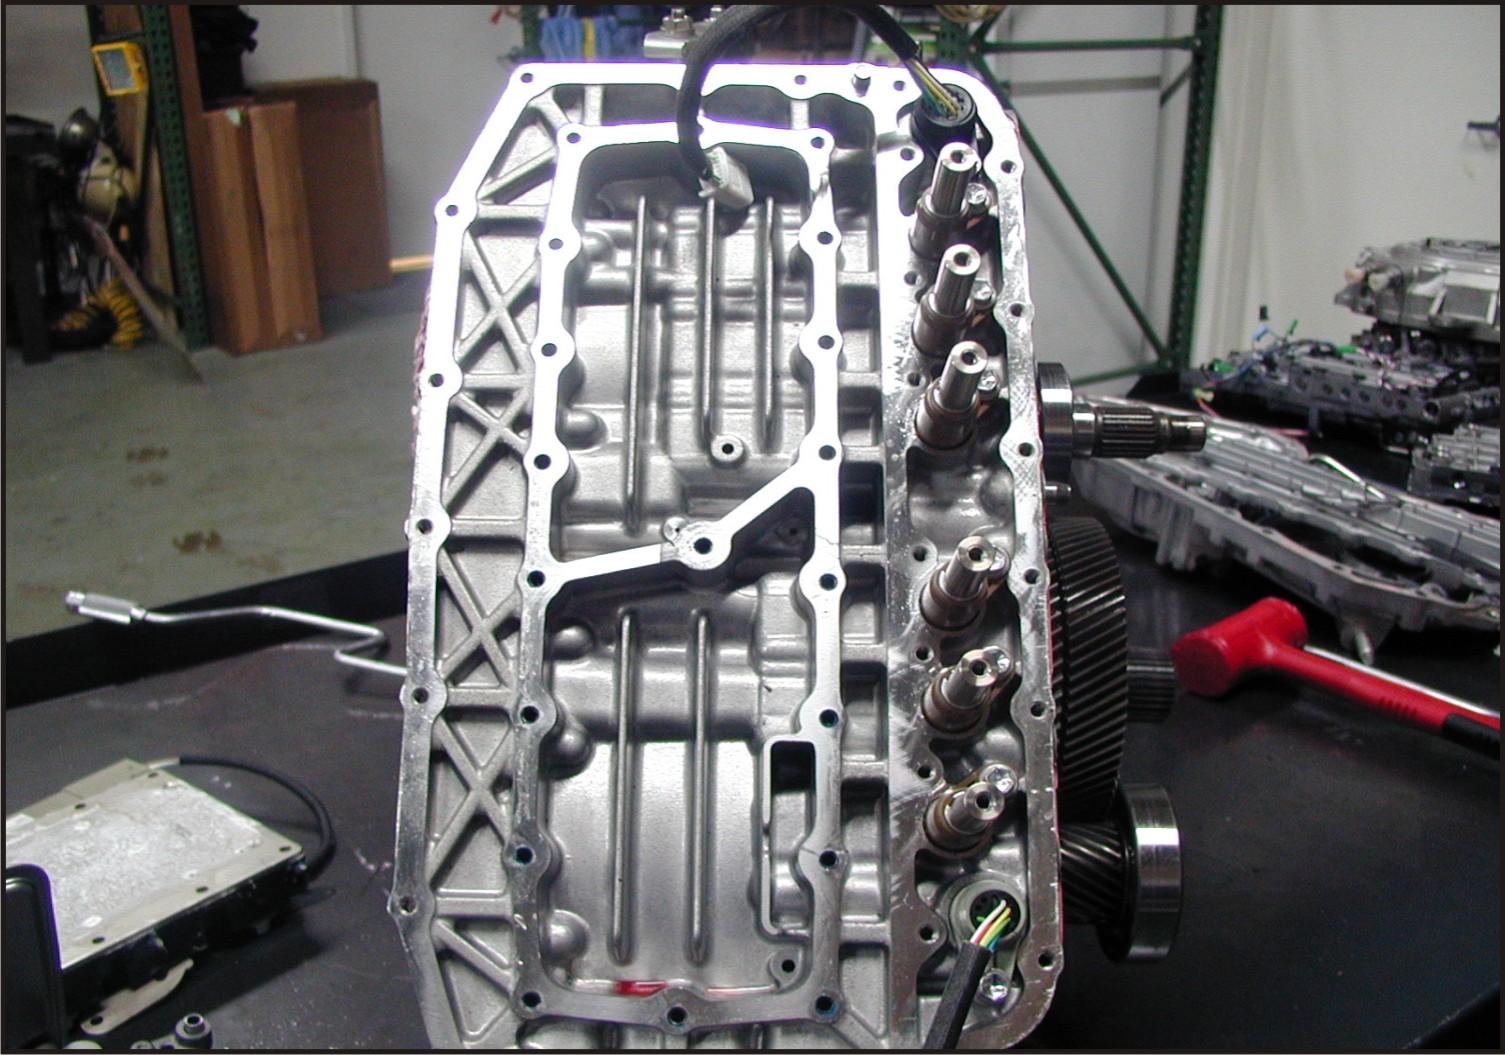 ATSG Ford Escape Hybrid Preliminary Information - Figure 30